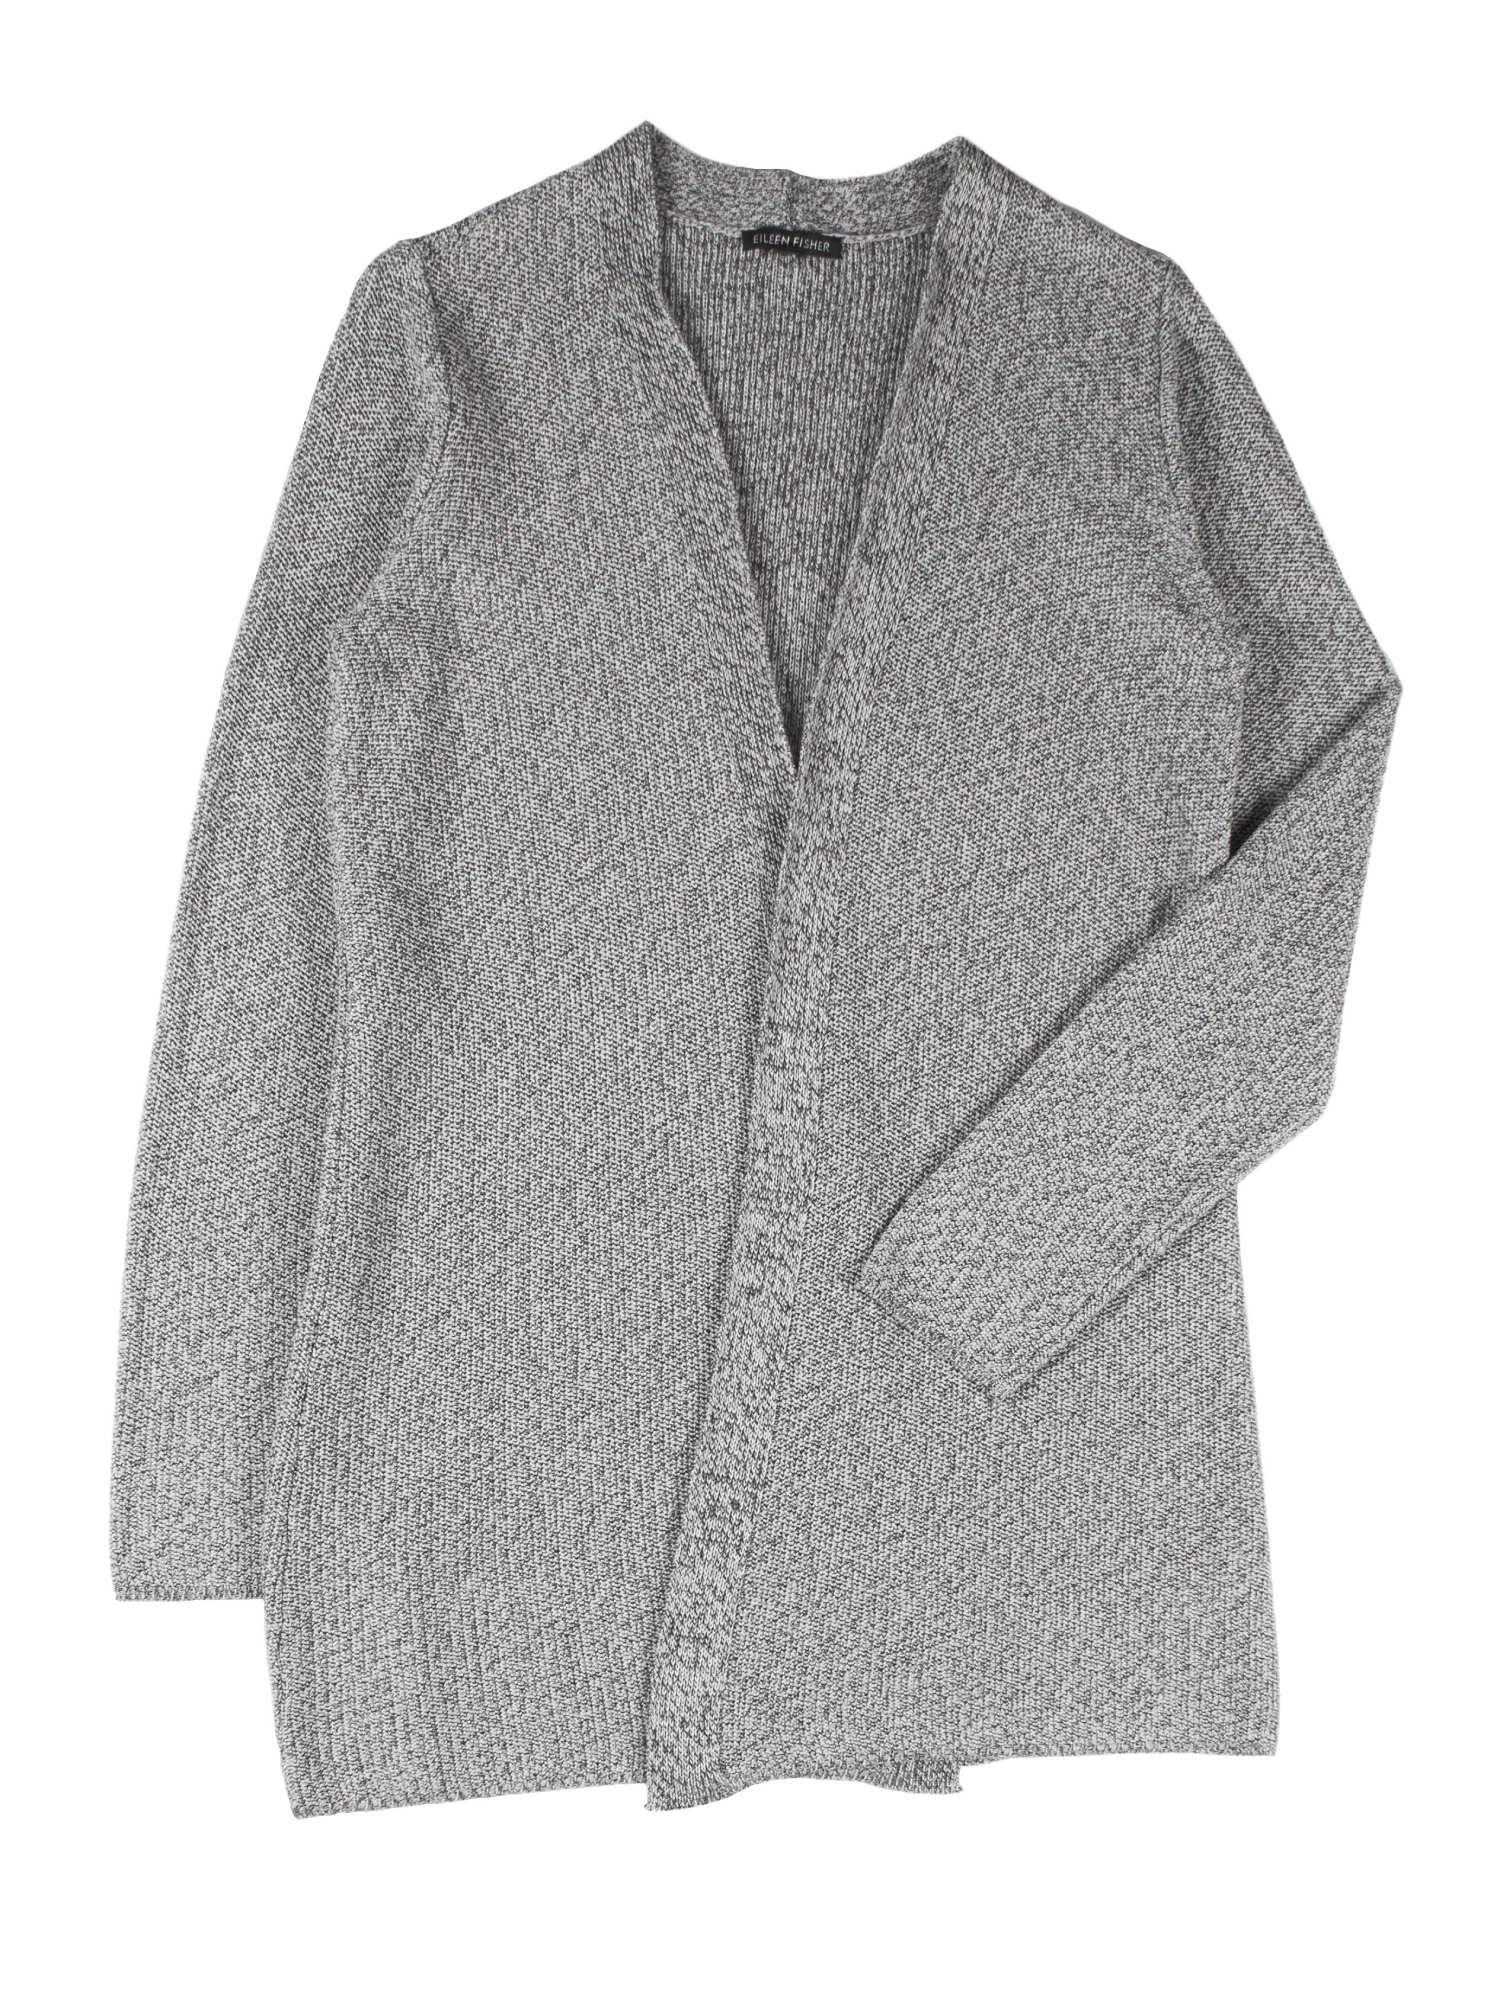 Sleek Tencel Twist Cardigan